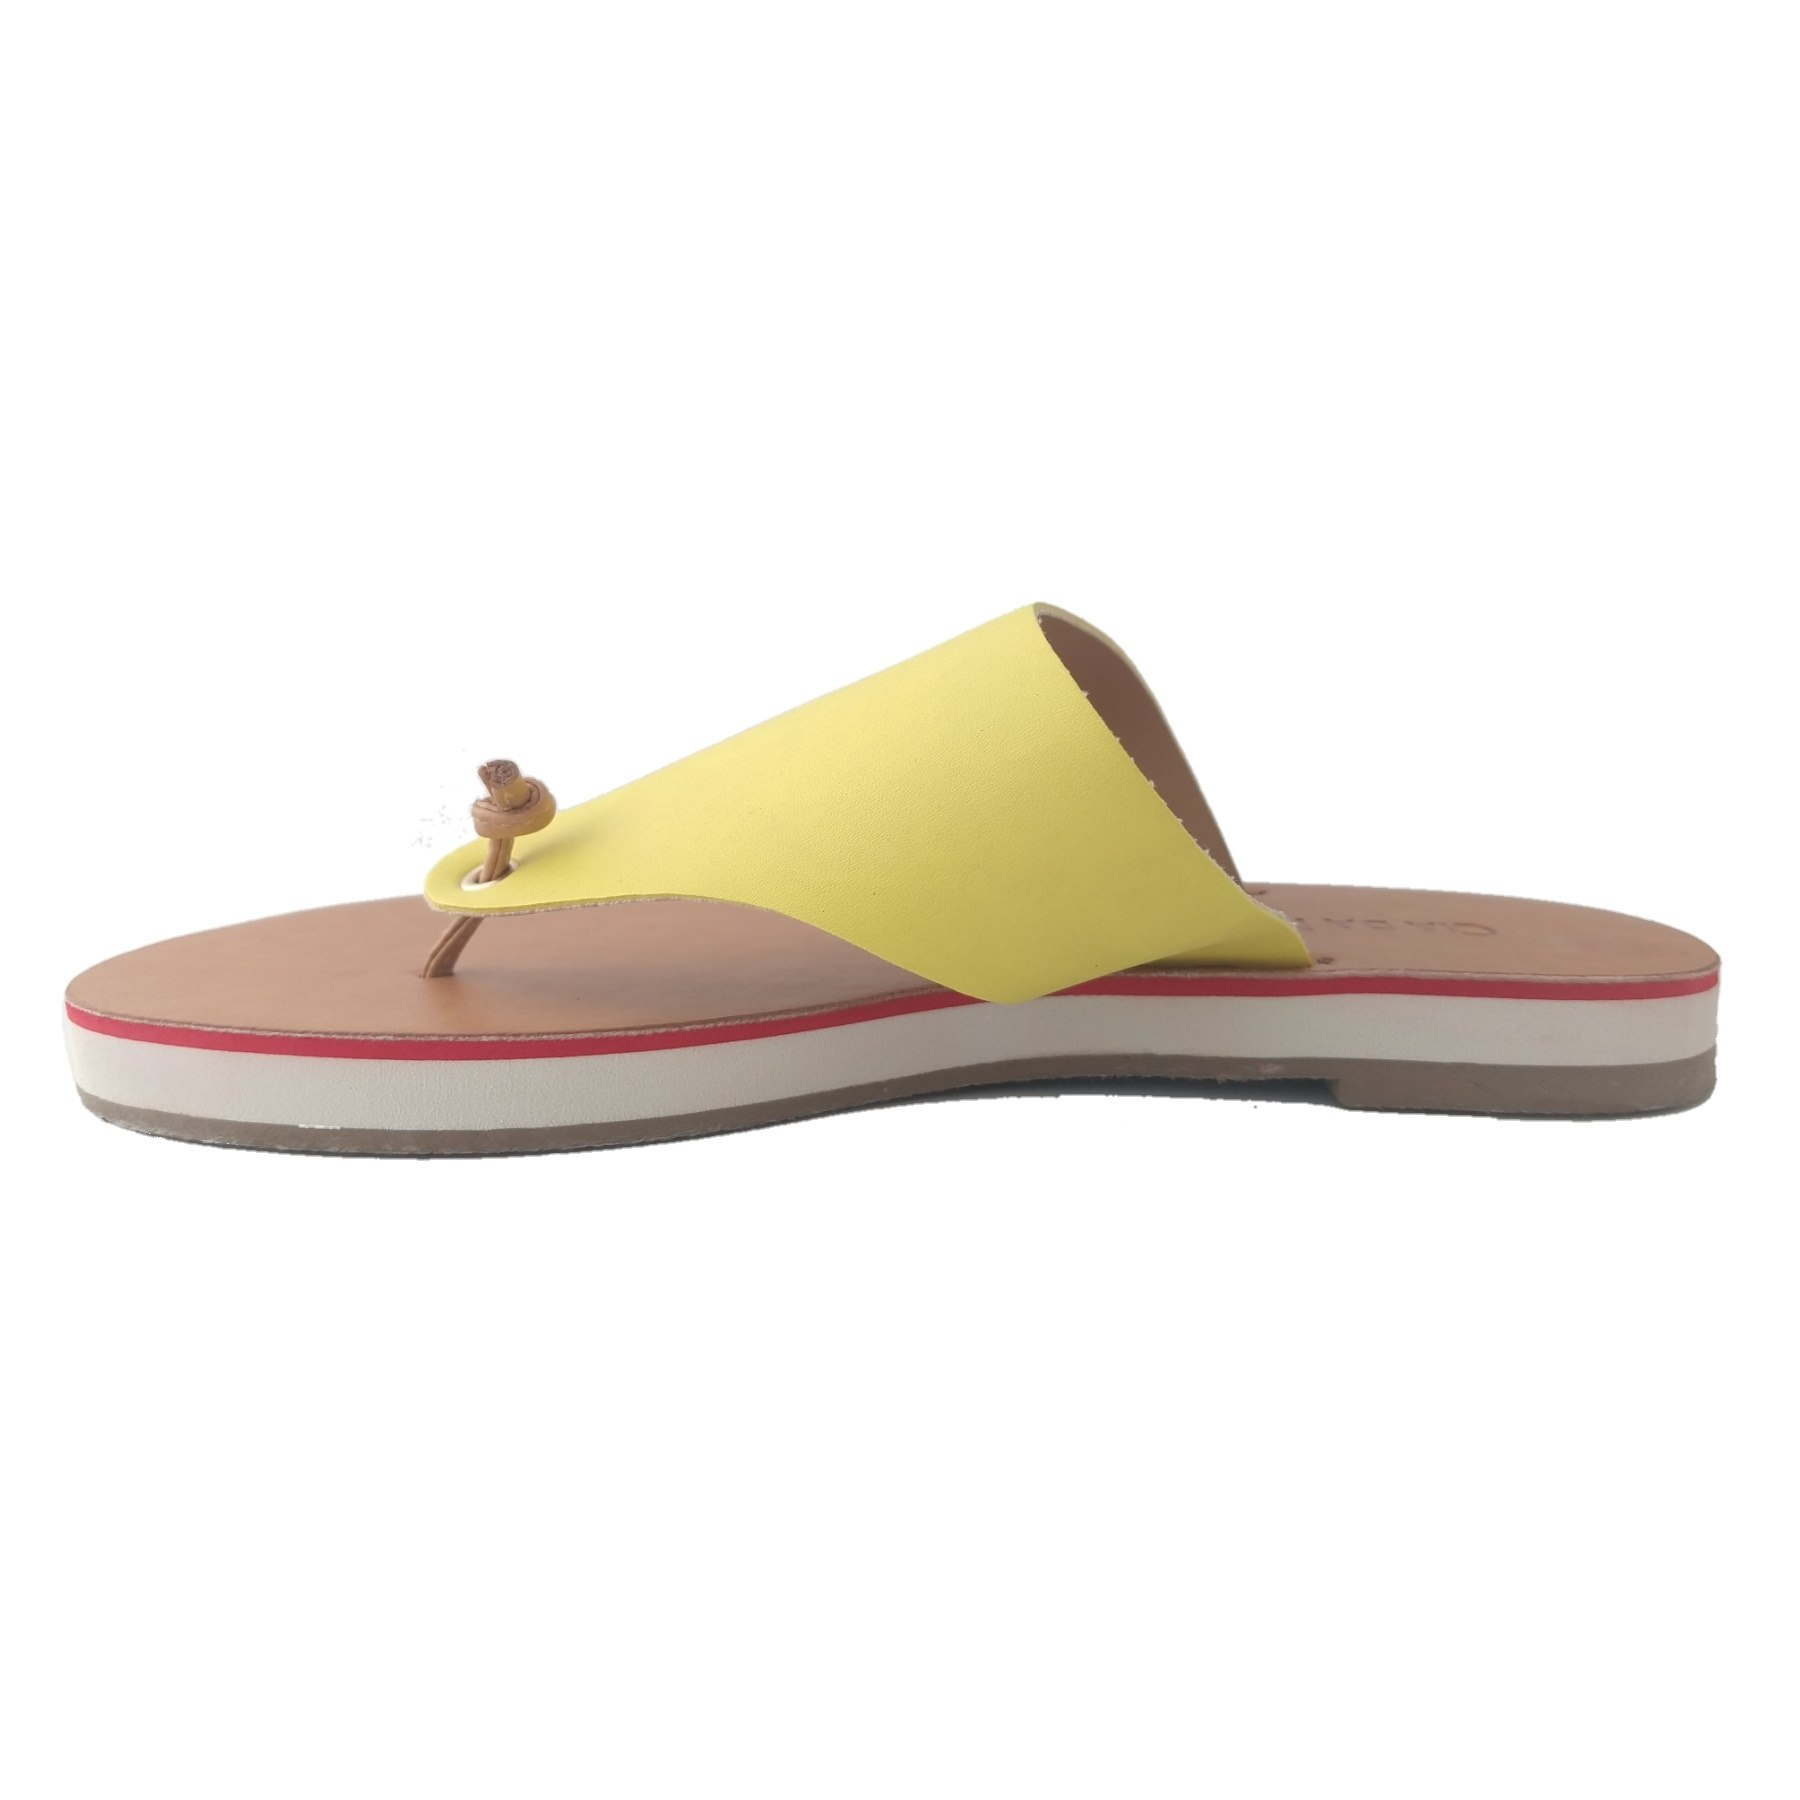 Rasteira SapatoWeb Couro Amarelo  - SAPATOWEB.COM